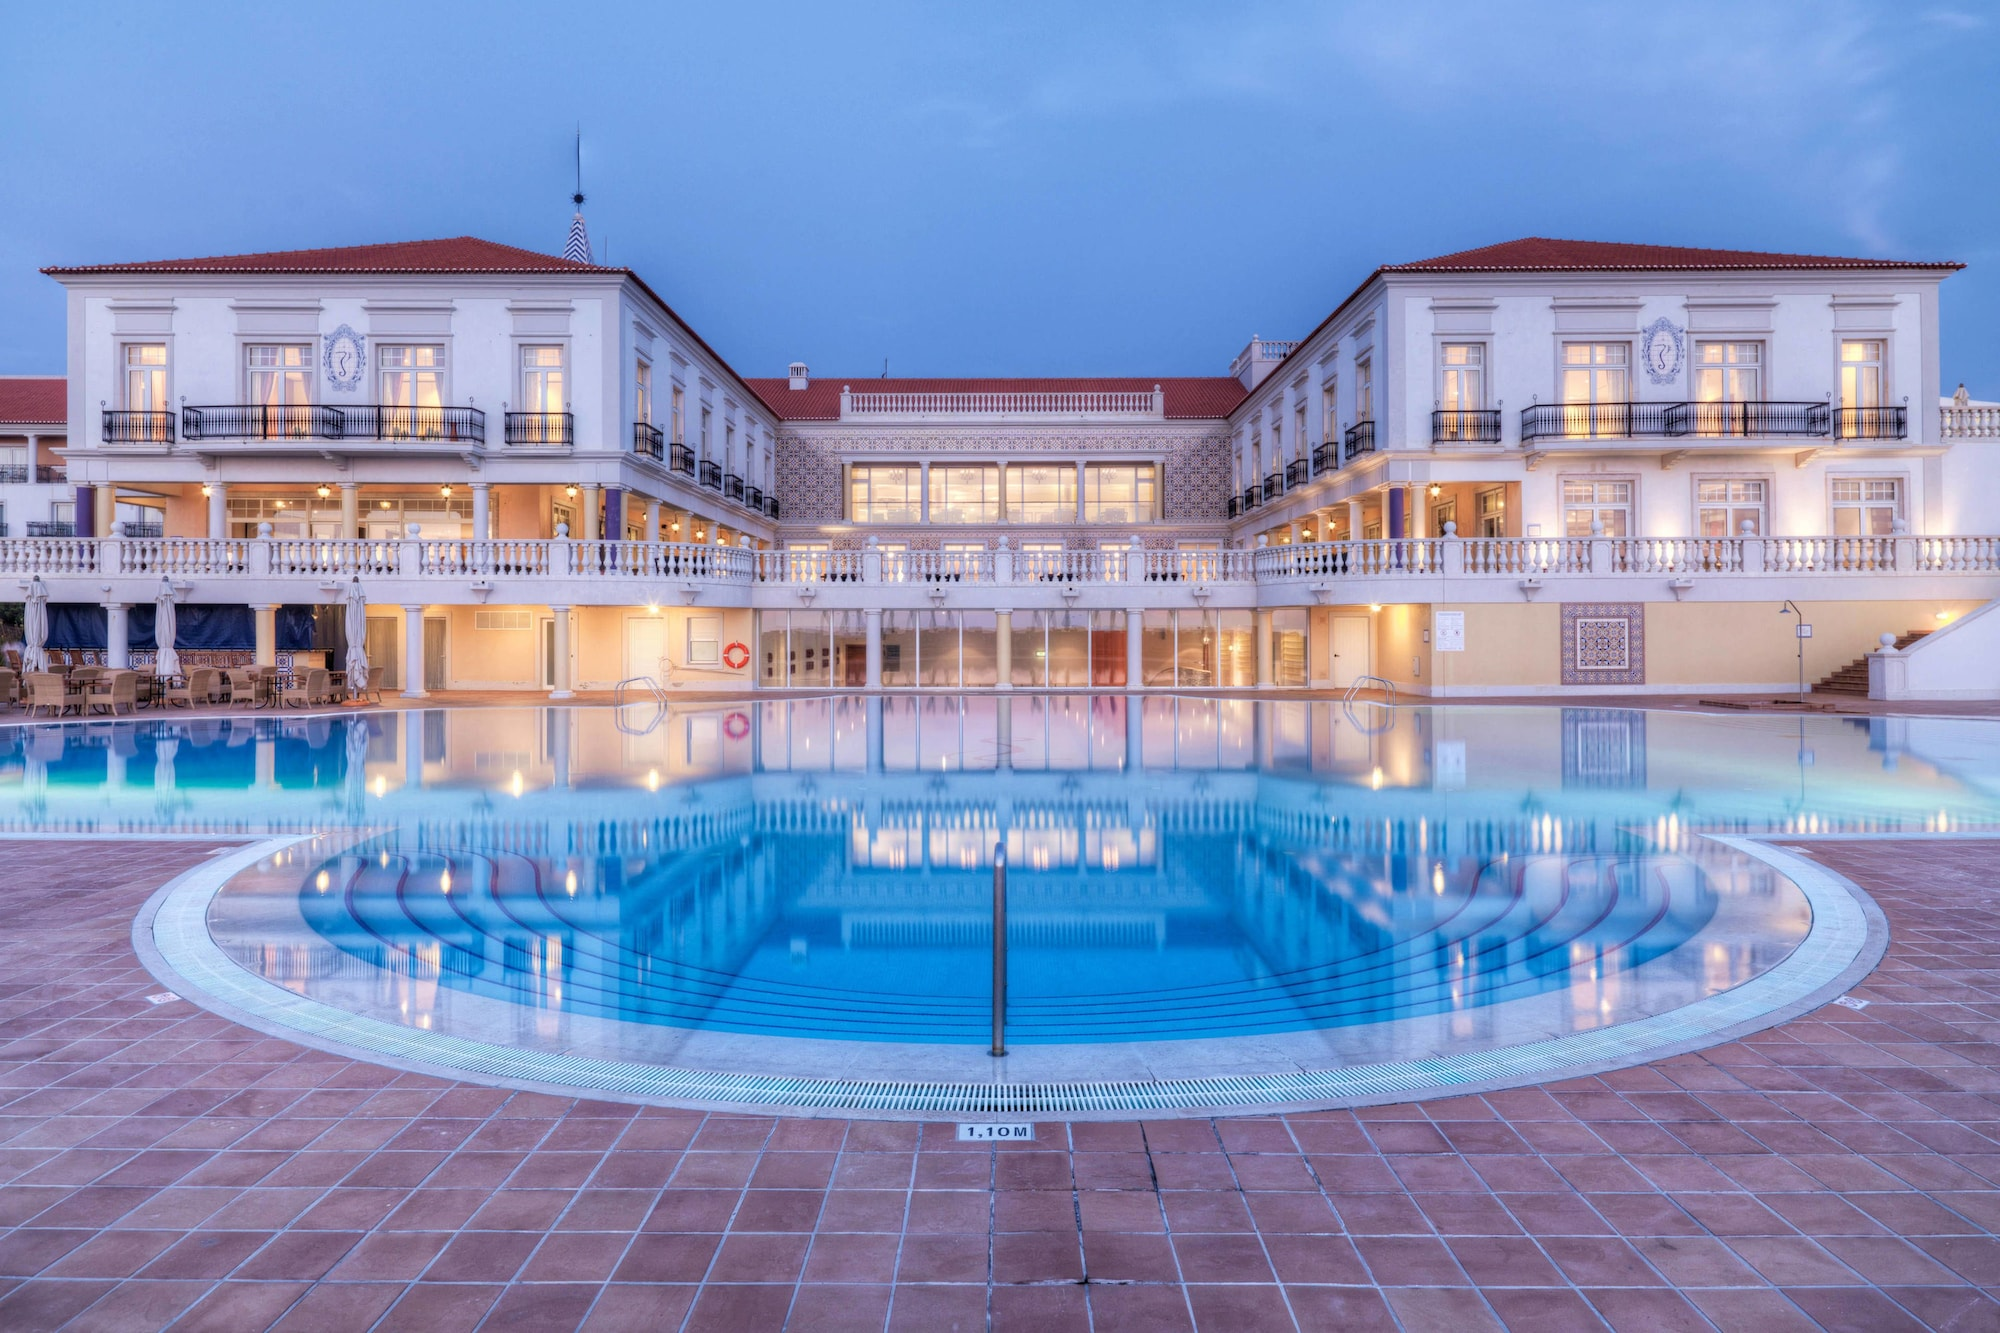 Praia D'El Rey Marriott Golf & Beach Resort, Óbidos